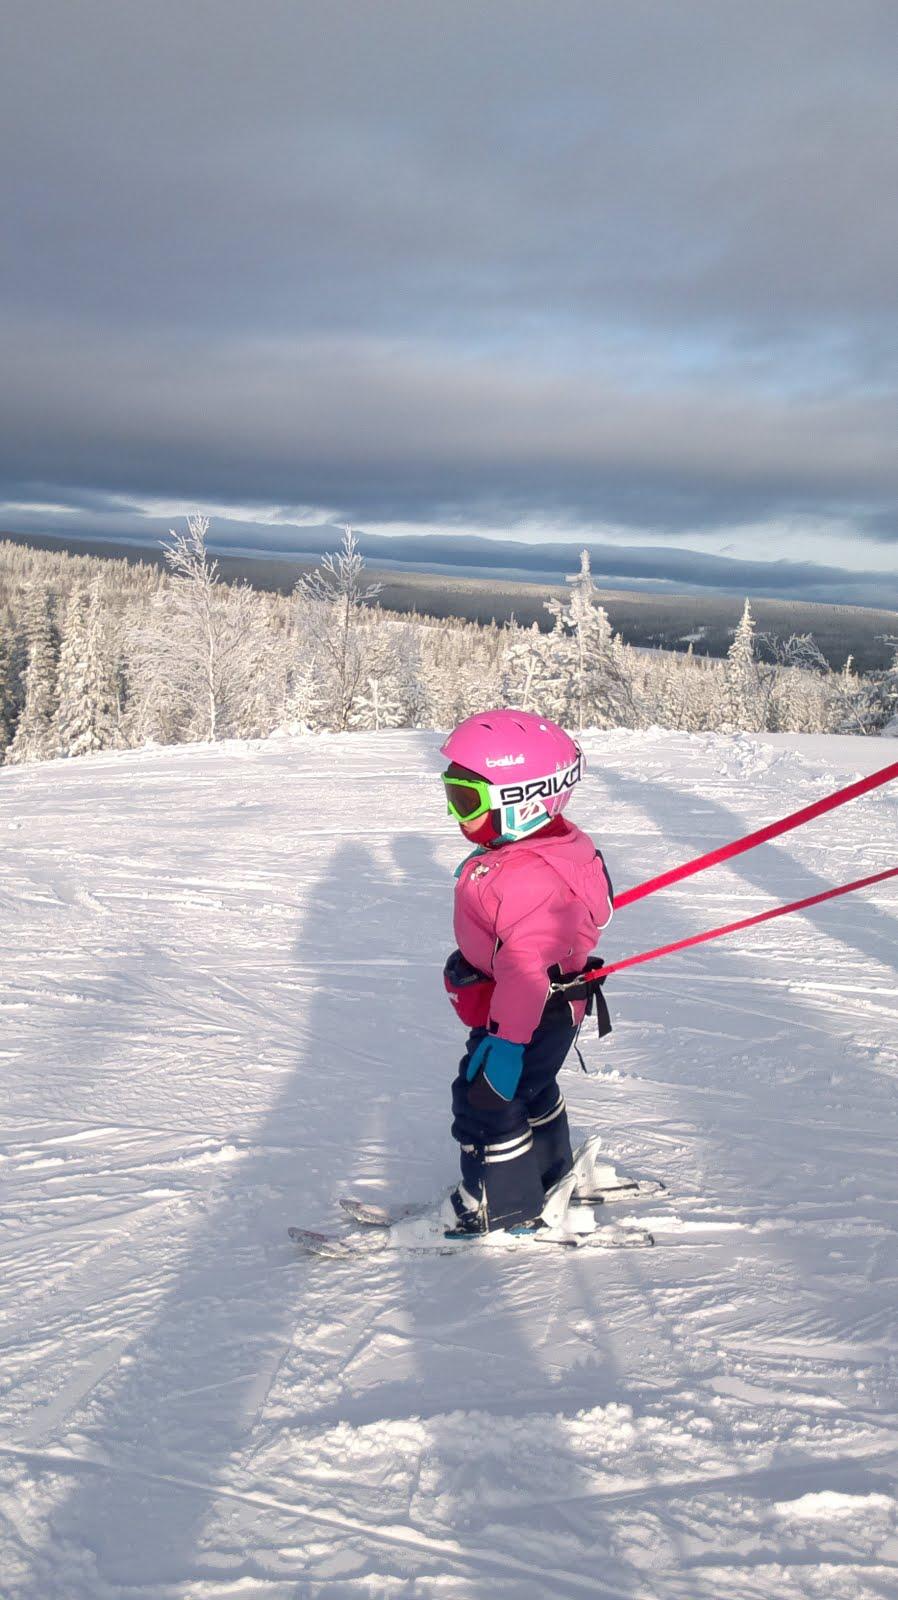 2-vuotias Roosa-Ilona laskettelee